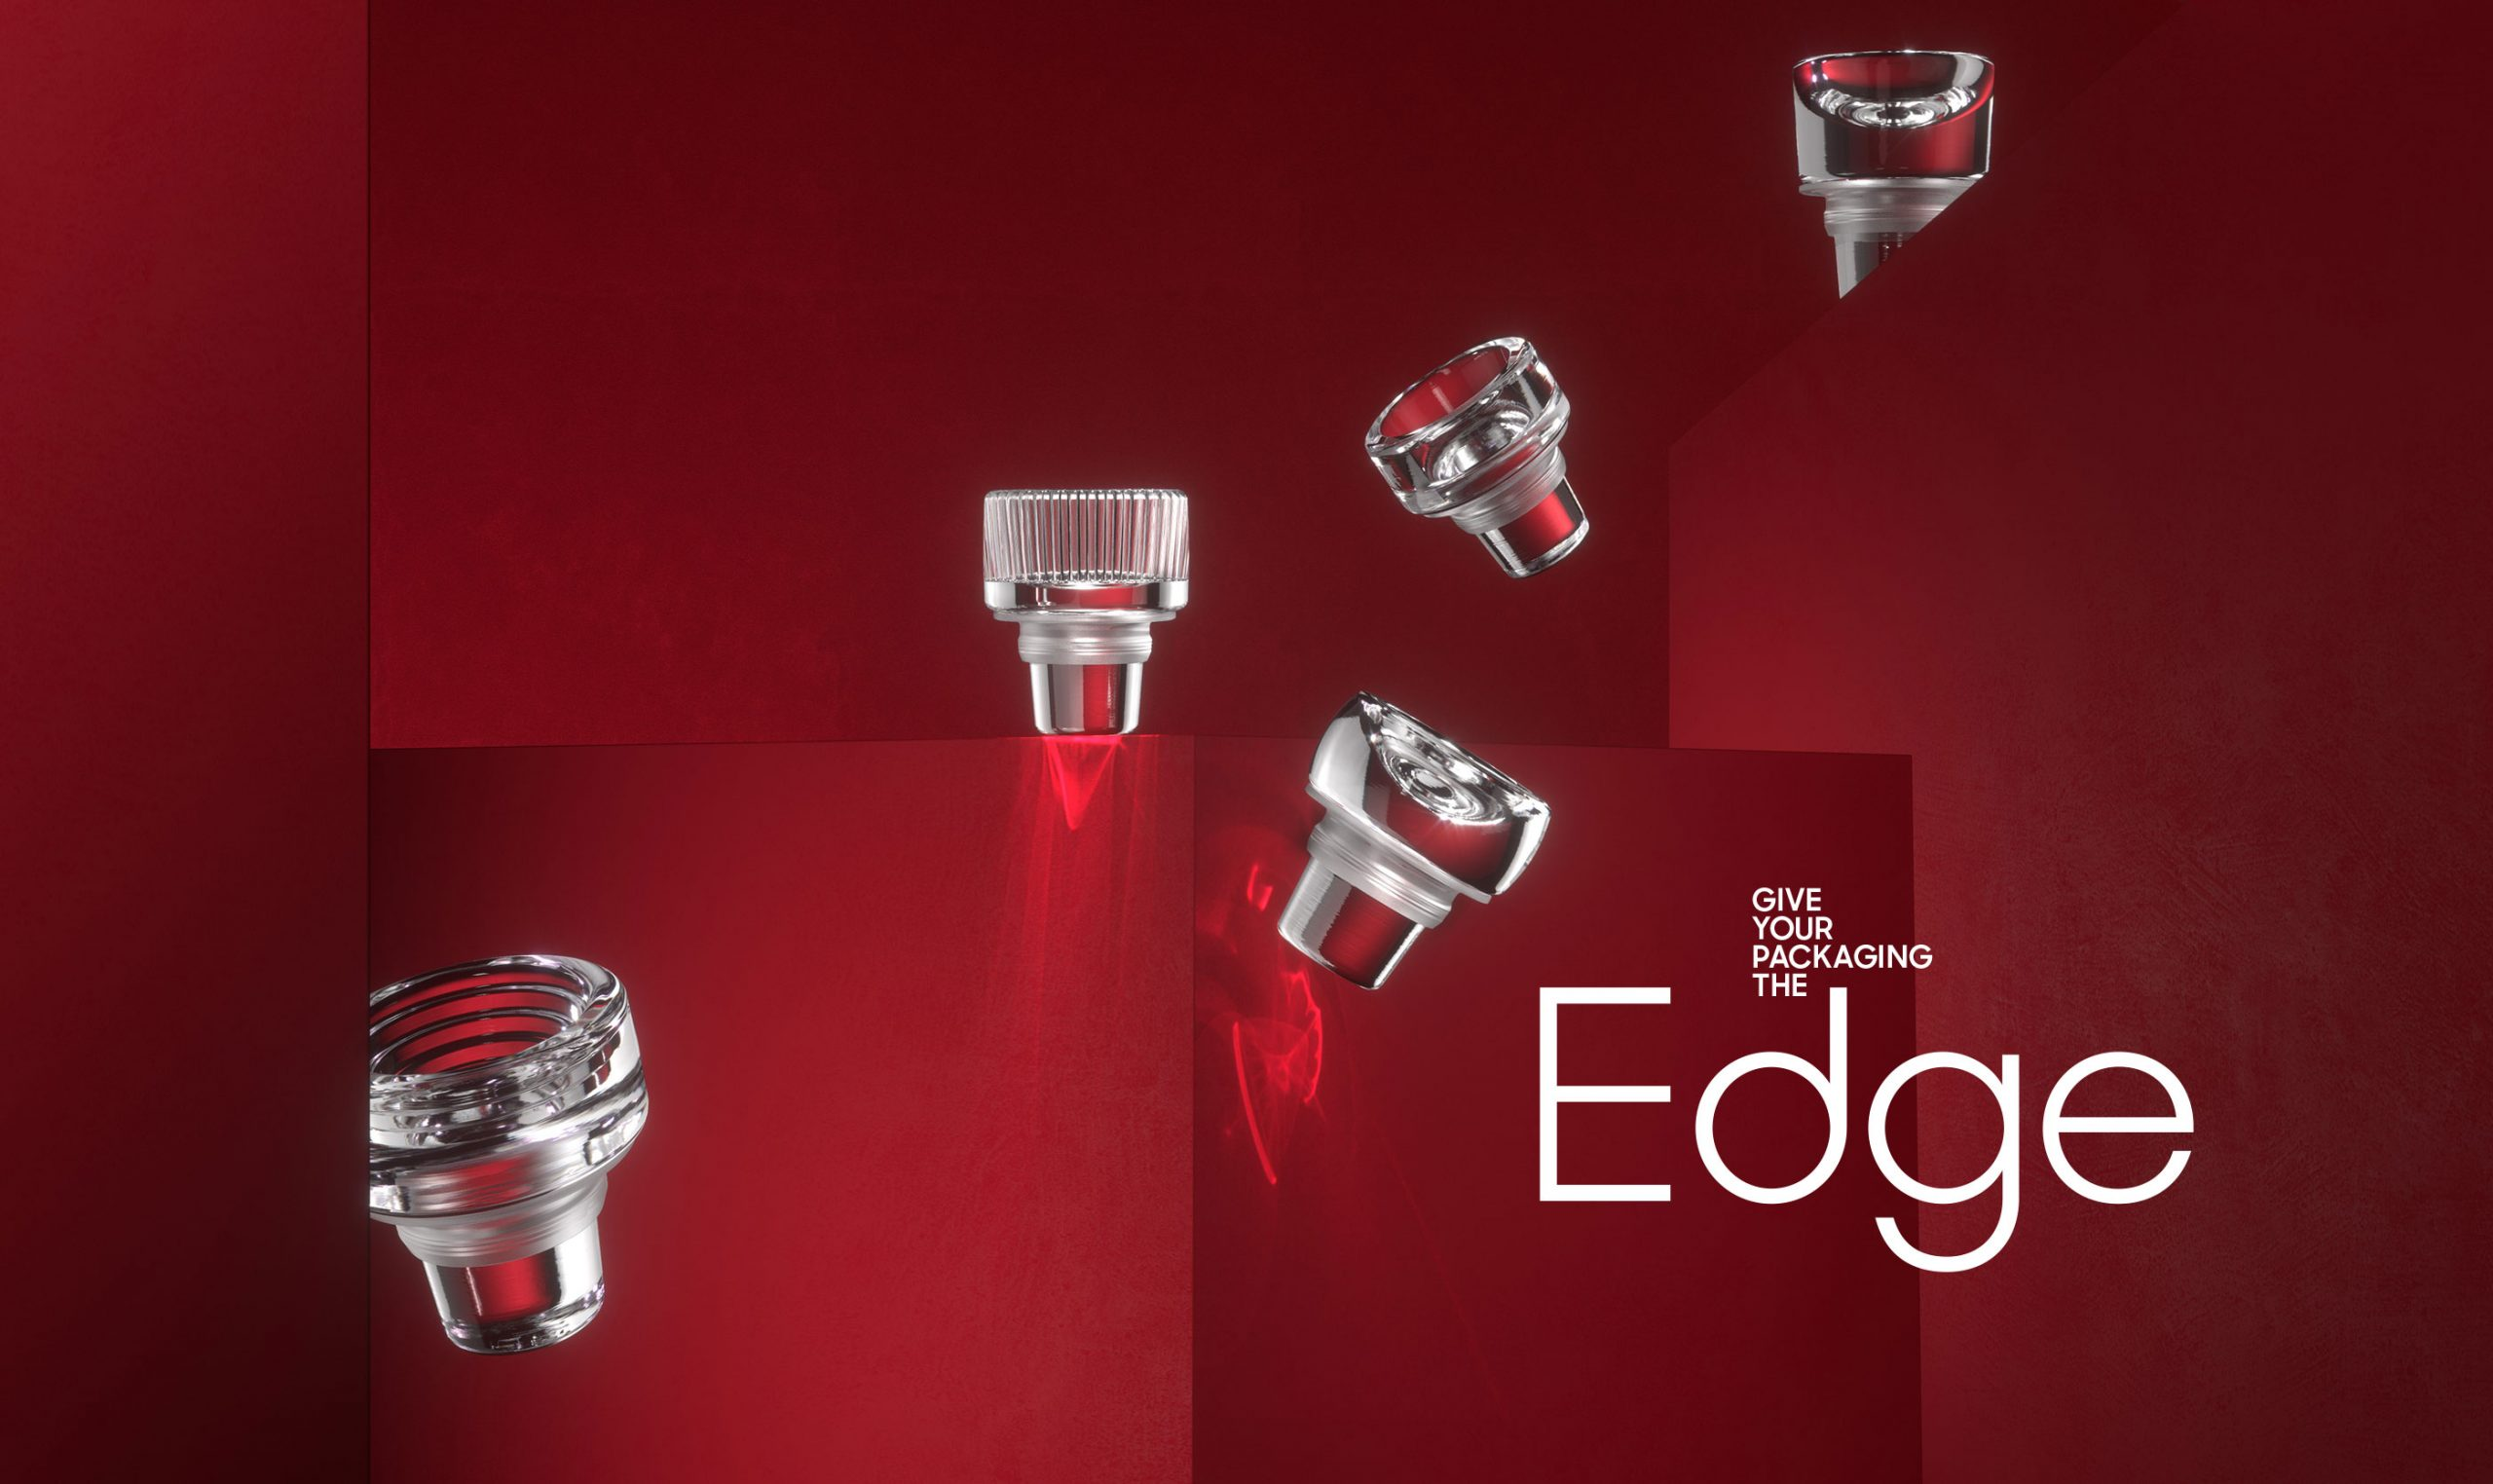 Vinolok-Edge-KV-2800